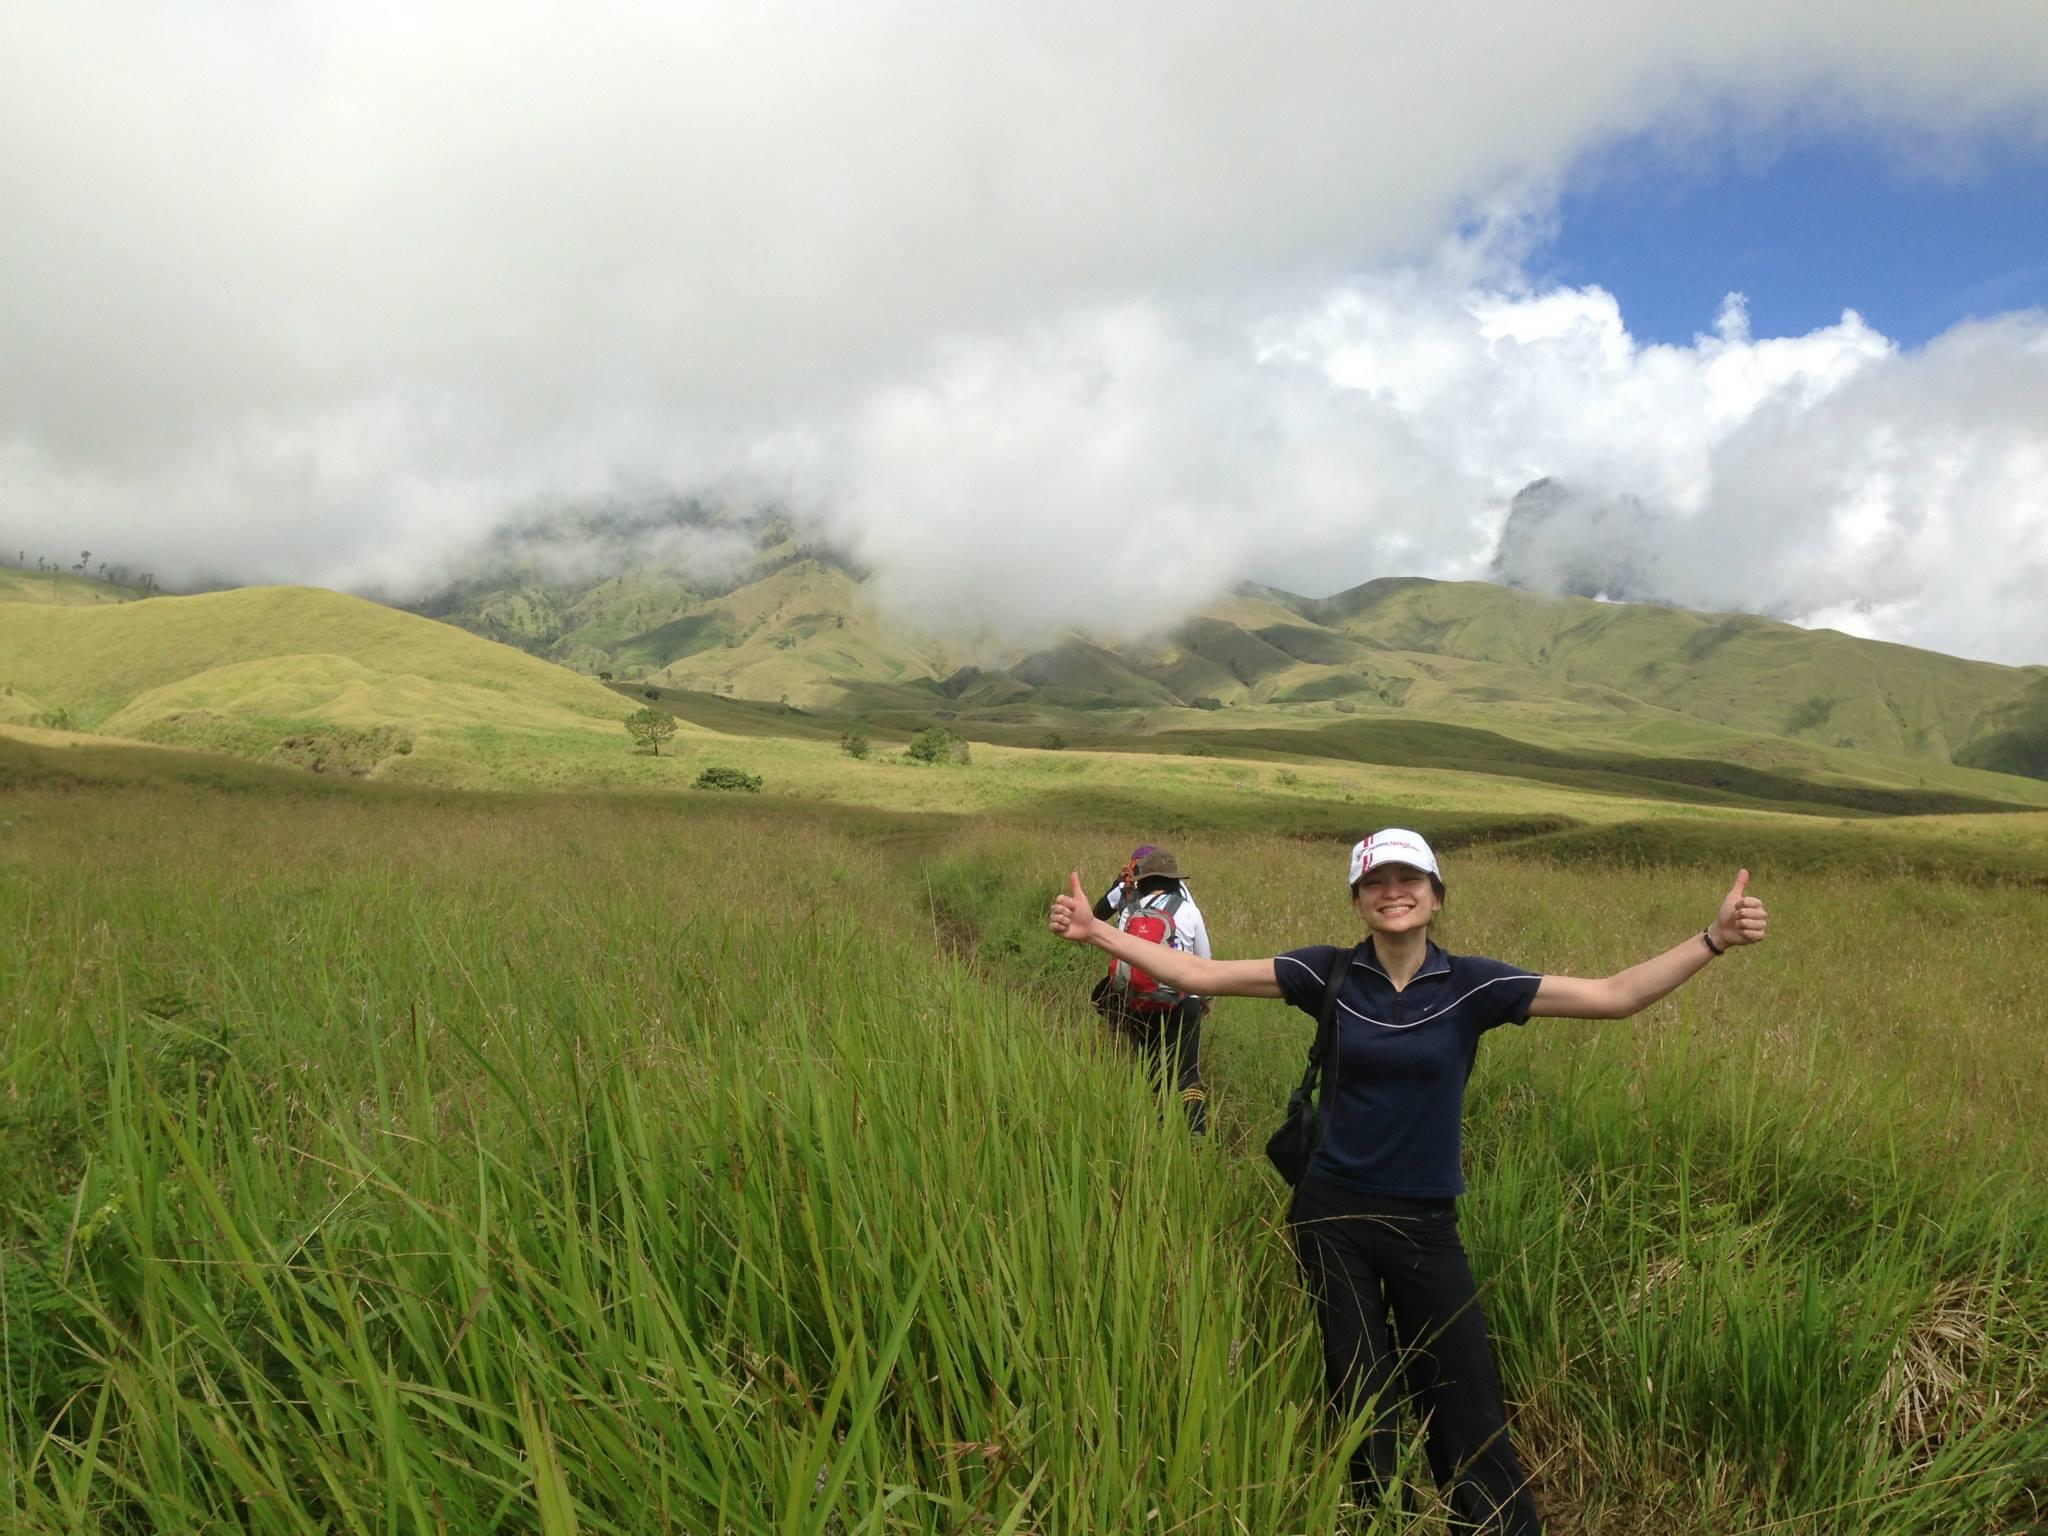 16 Padang Rumput Cantik Yang Akan Membuatmu Semakin Mencintai